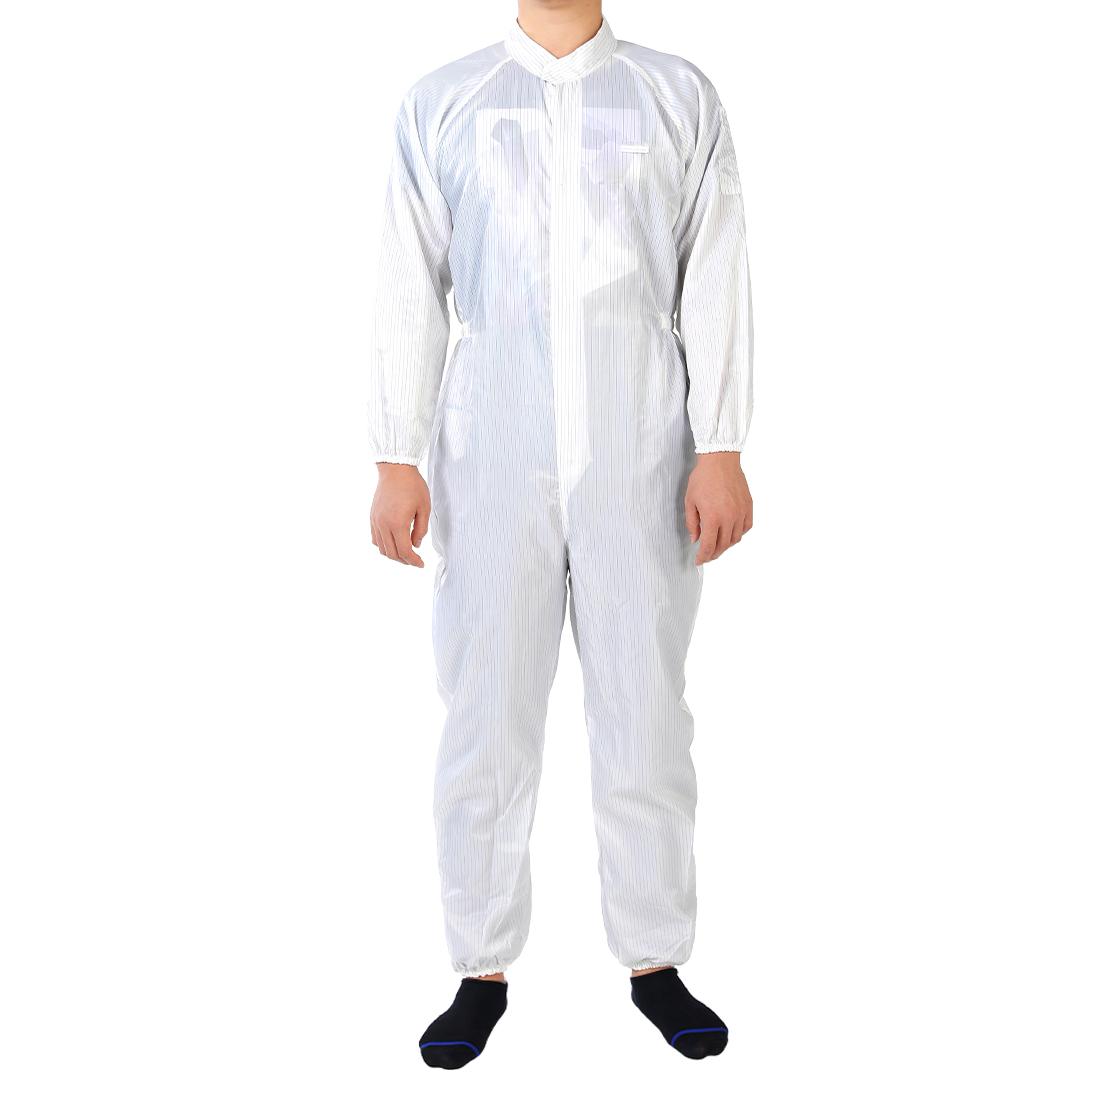 Anti Static Overalls Siamese Unisex ESD Lab Coat Button Up XXL White